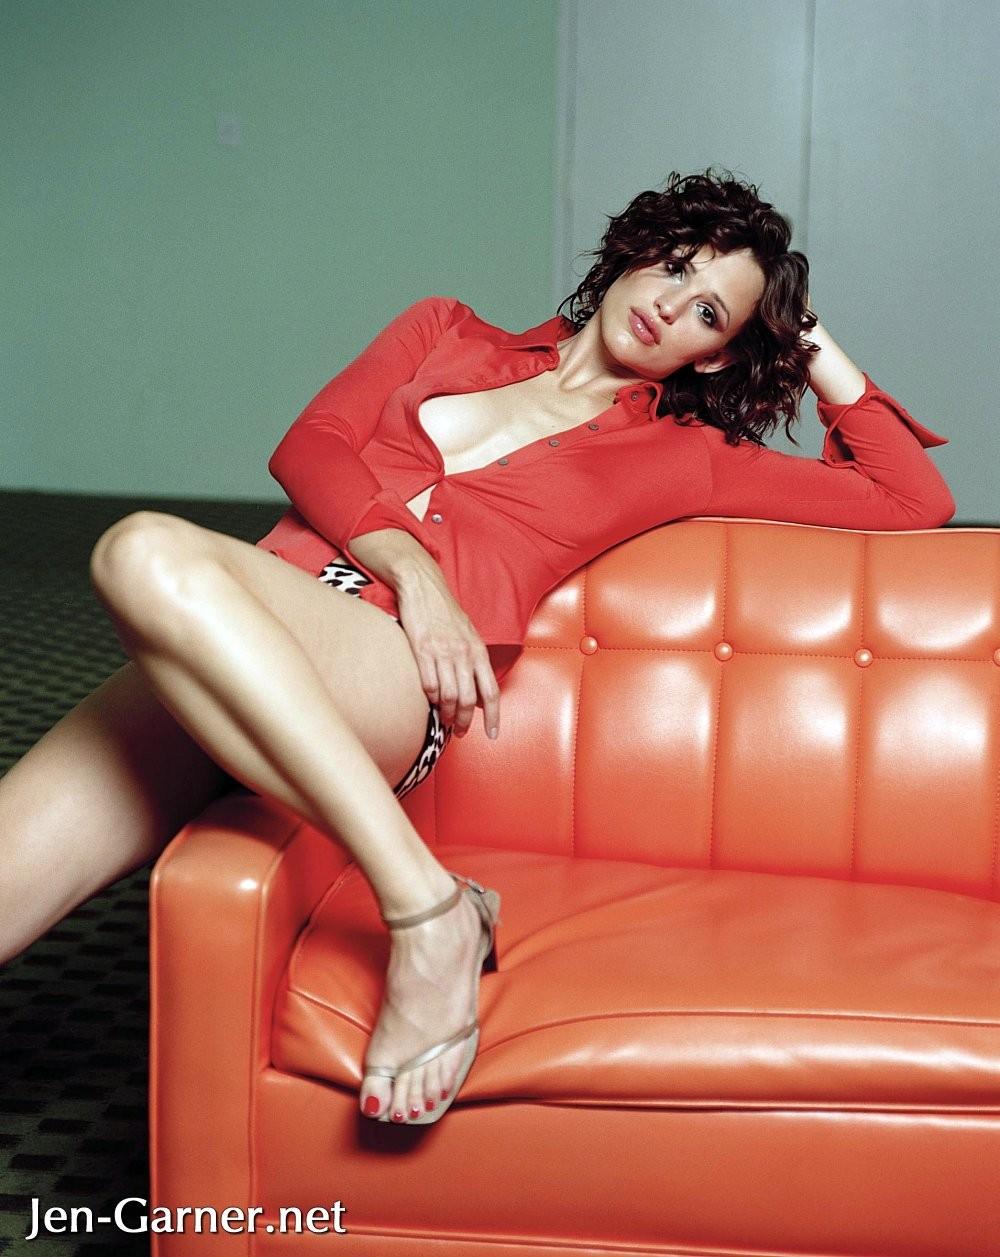 Jennifer-Garner-Feet-54123.jpg